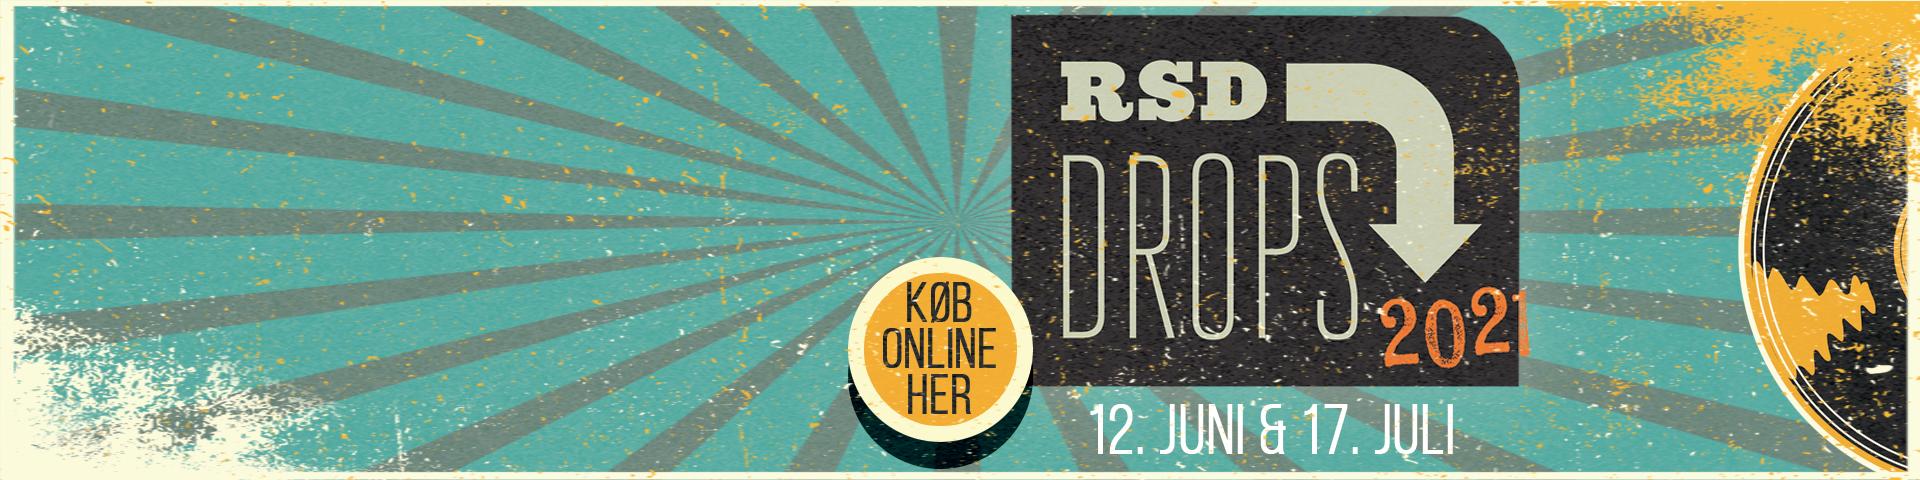 /r/s/rsd-drops-1-online-salg-danmark.png